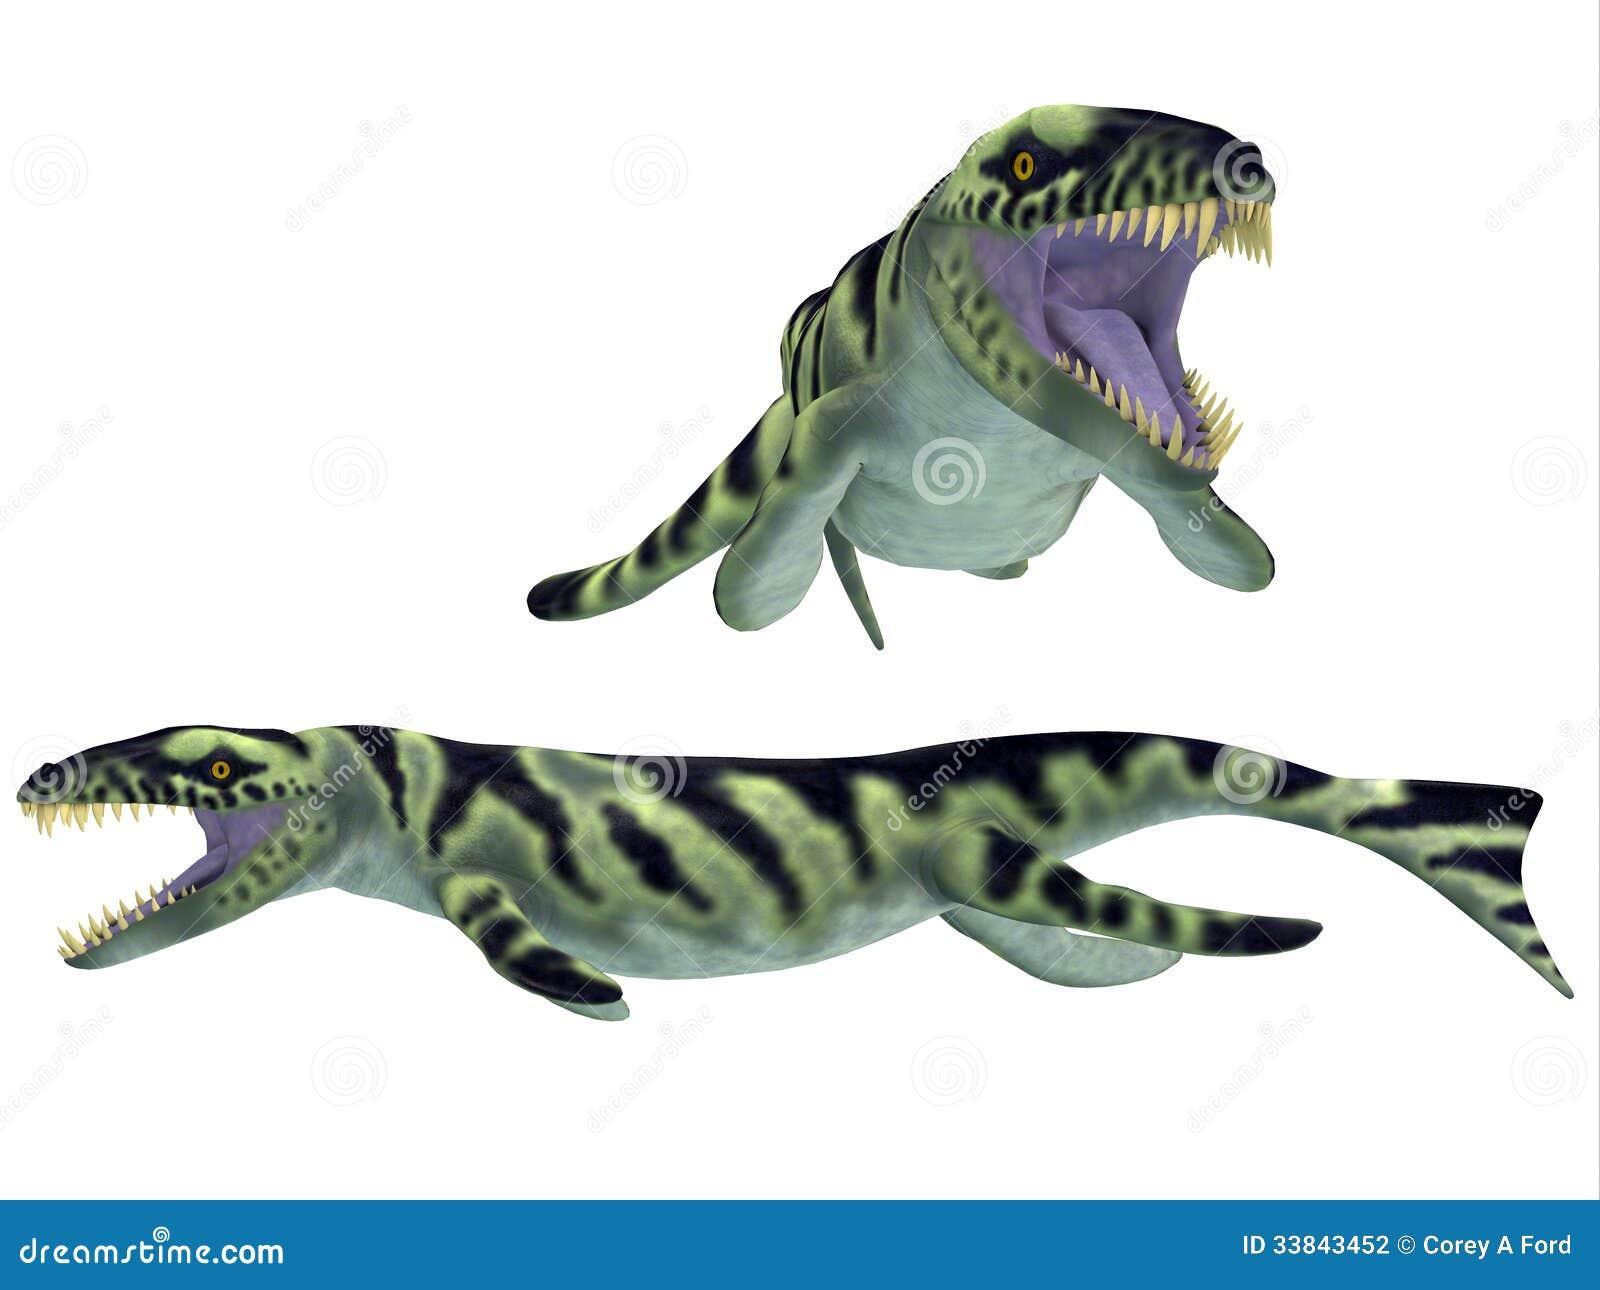 dakosaurus on white stock photography image 33843452 reptile clipart public domain reptile clipart free